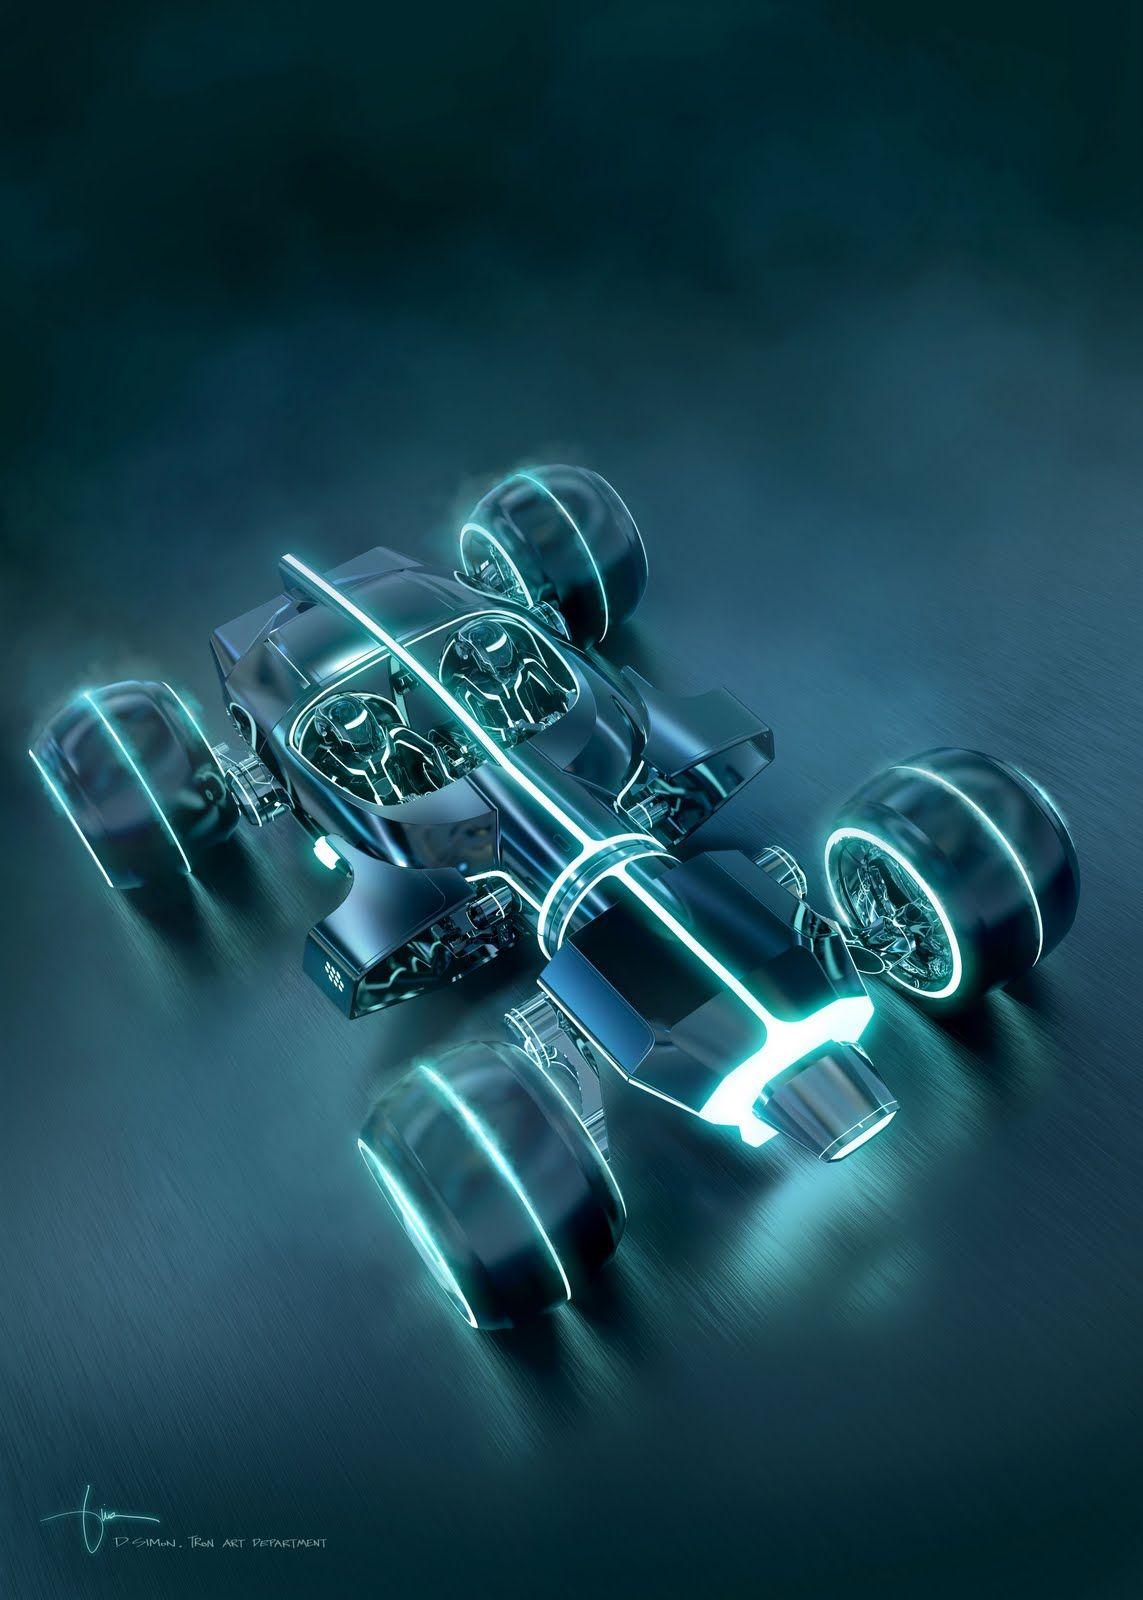 Tron Legacy Car Concept